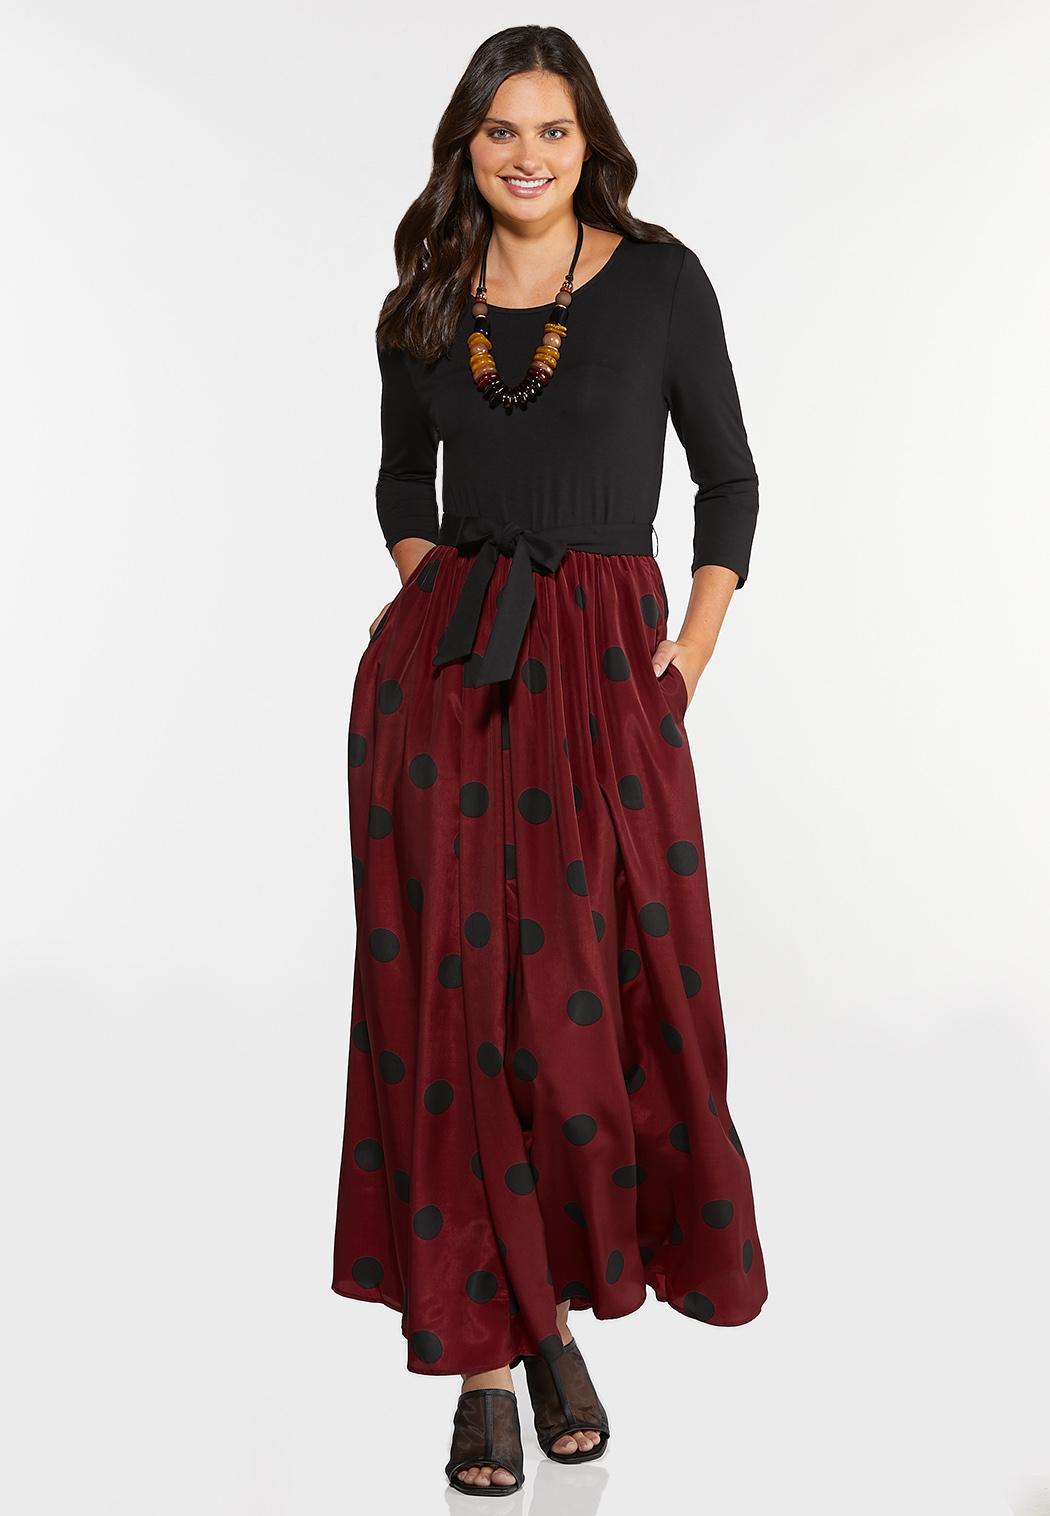 Polka Dot Colorblock Dress